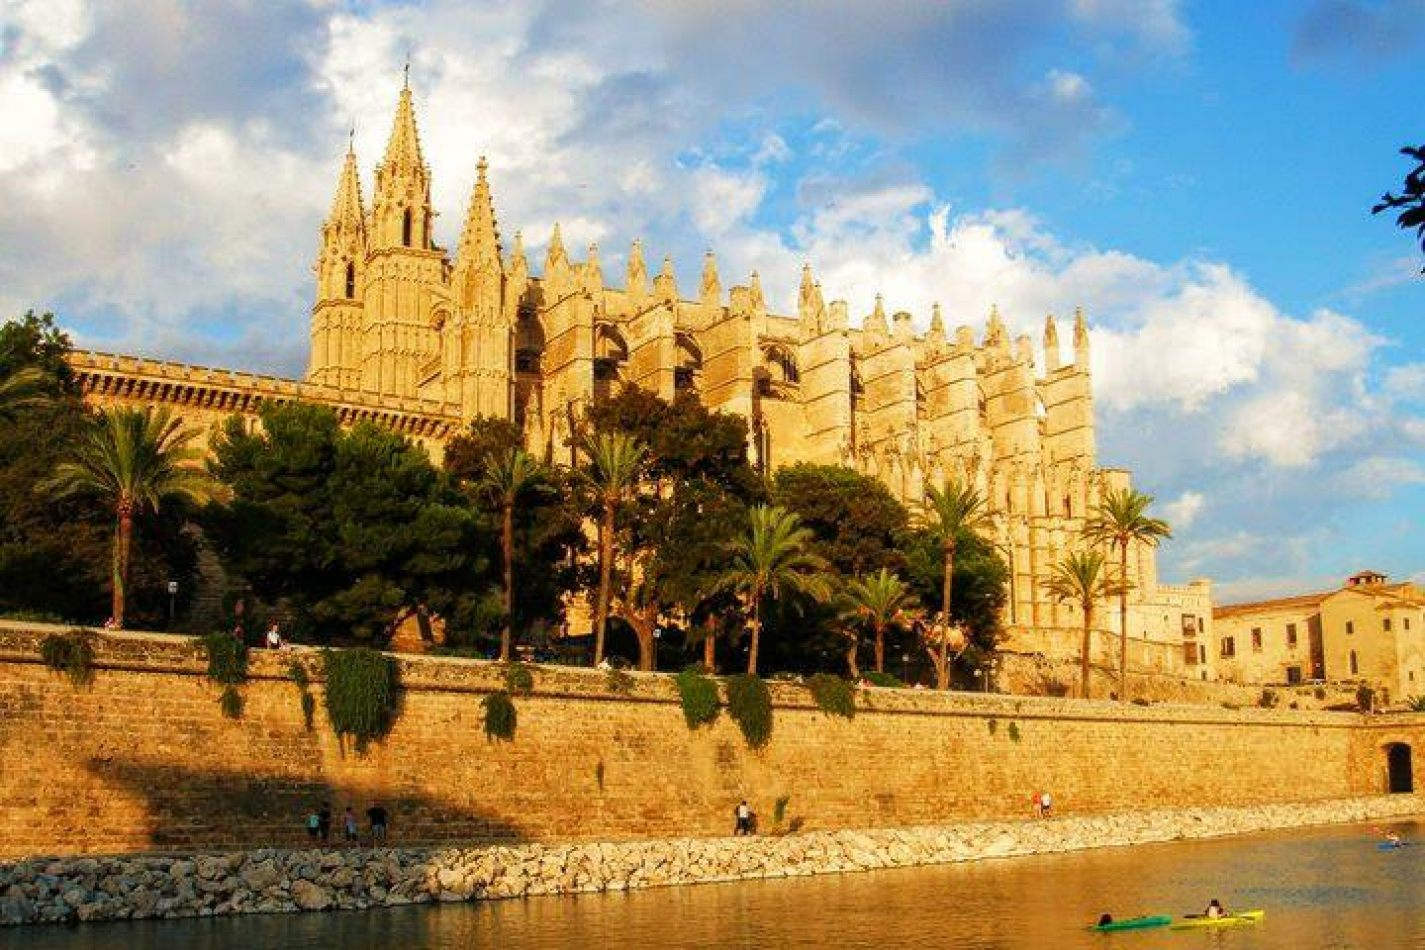 Hibiscus & Nomada : Palma de Mallorca - Palau de l'Almudaina